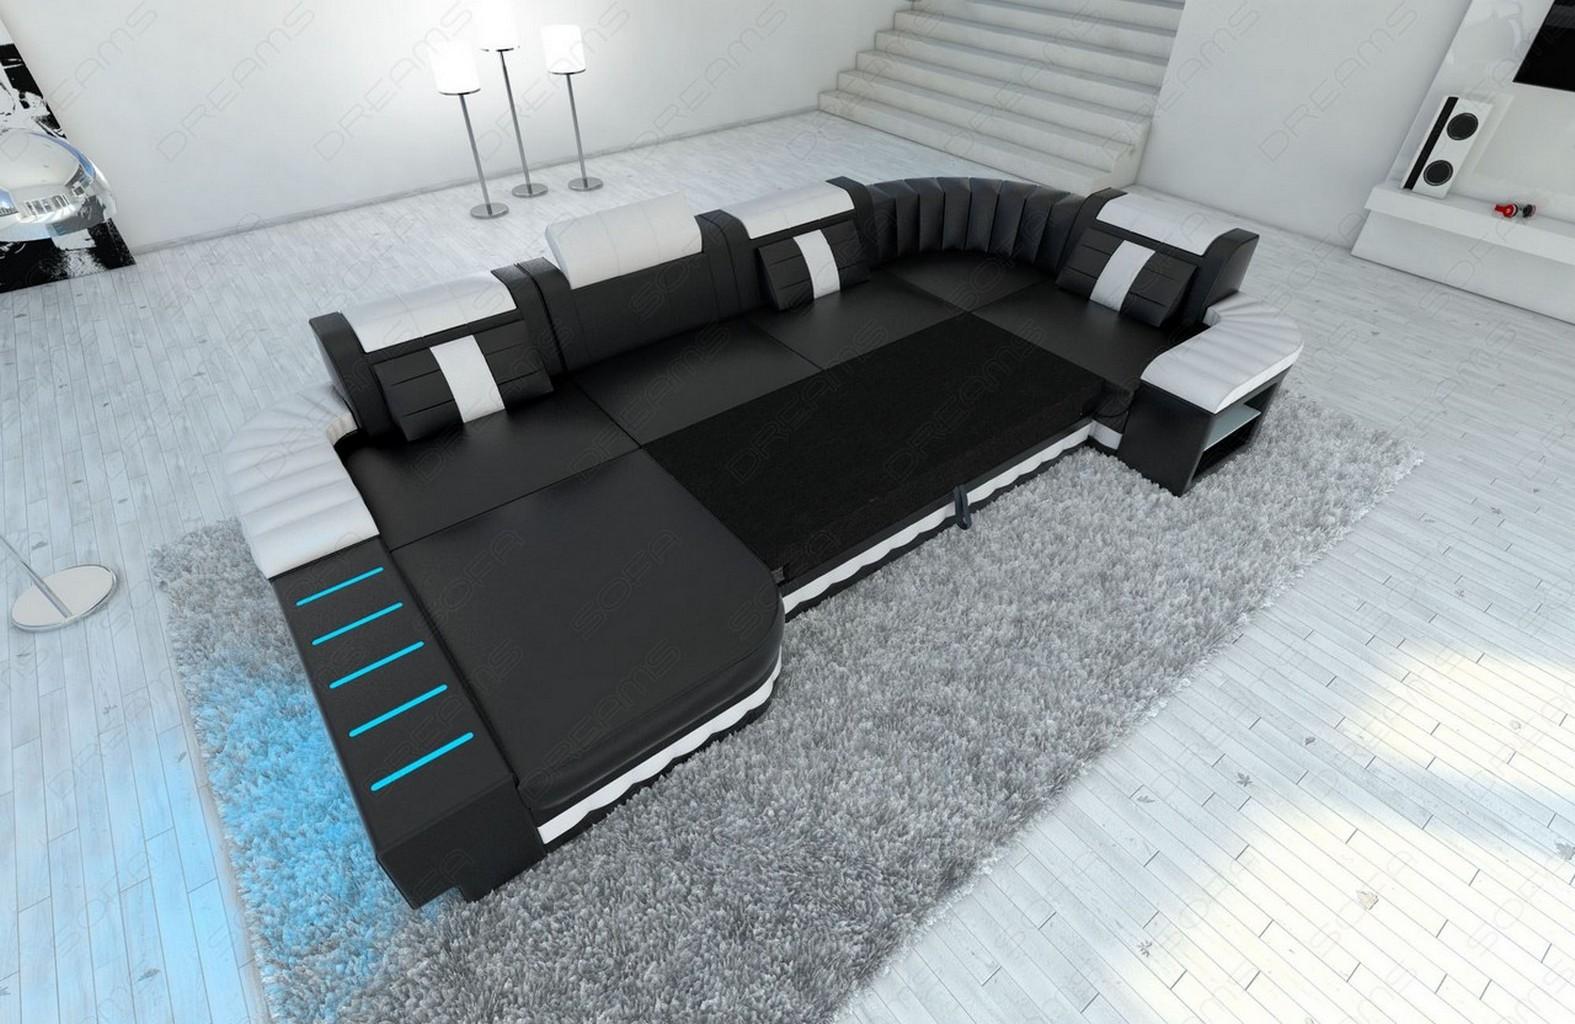 big upholstery fabric sofa bellagio u shape with led lights design sofa ebay. Black Bedroom Furniture Sets. Home Design Ideas